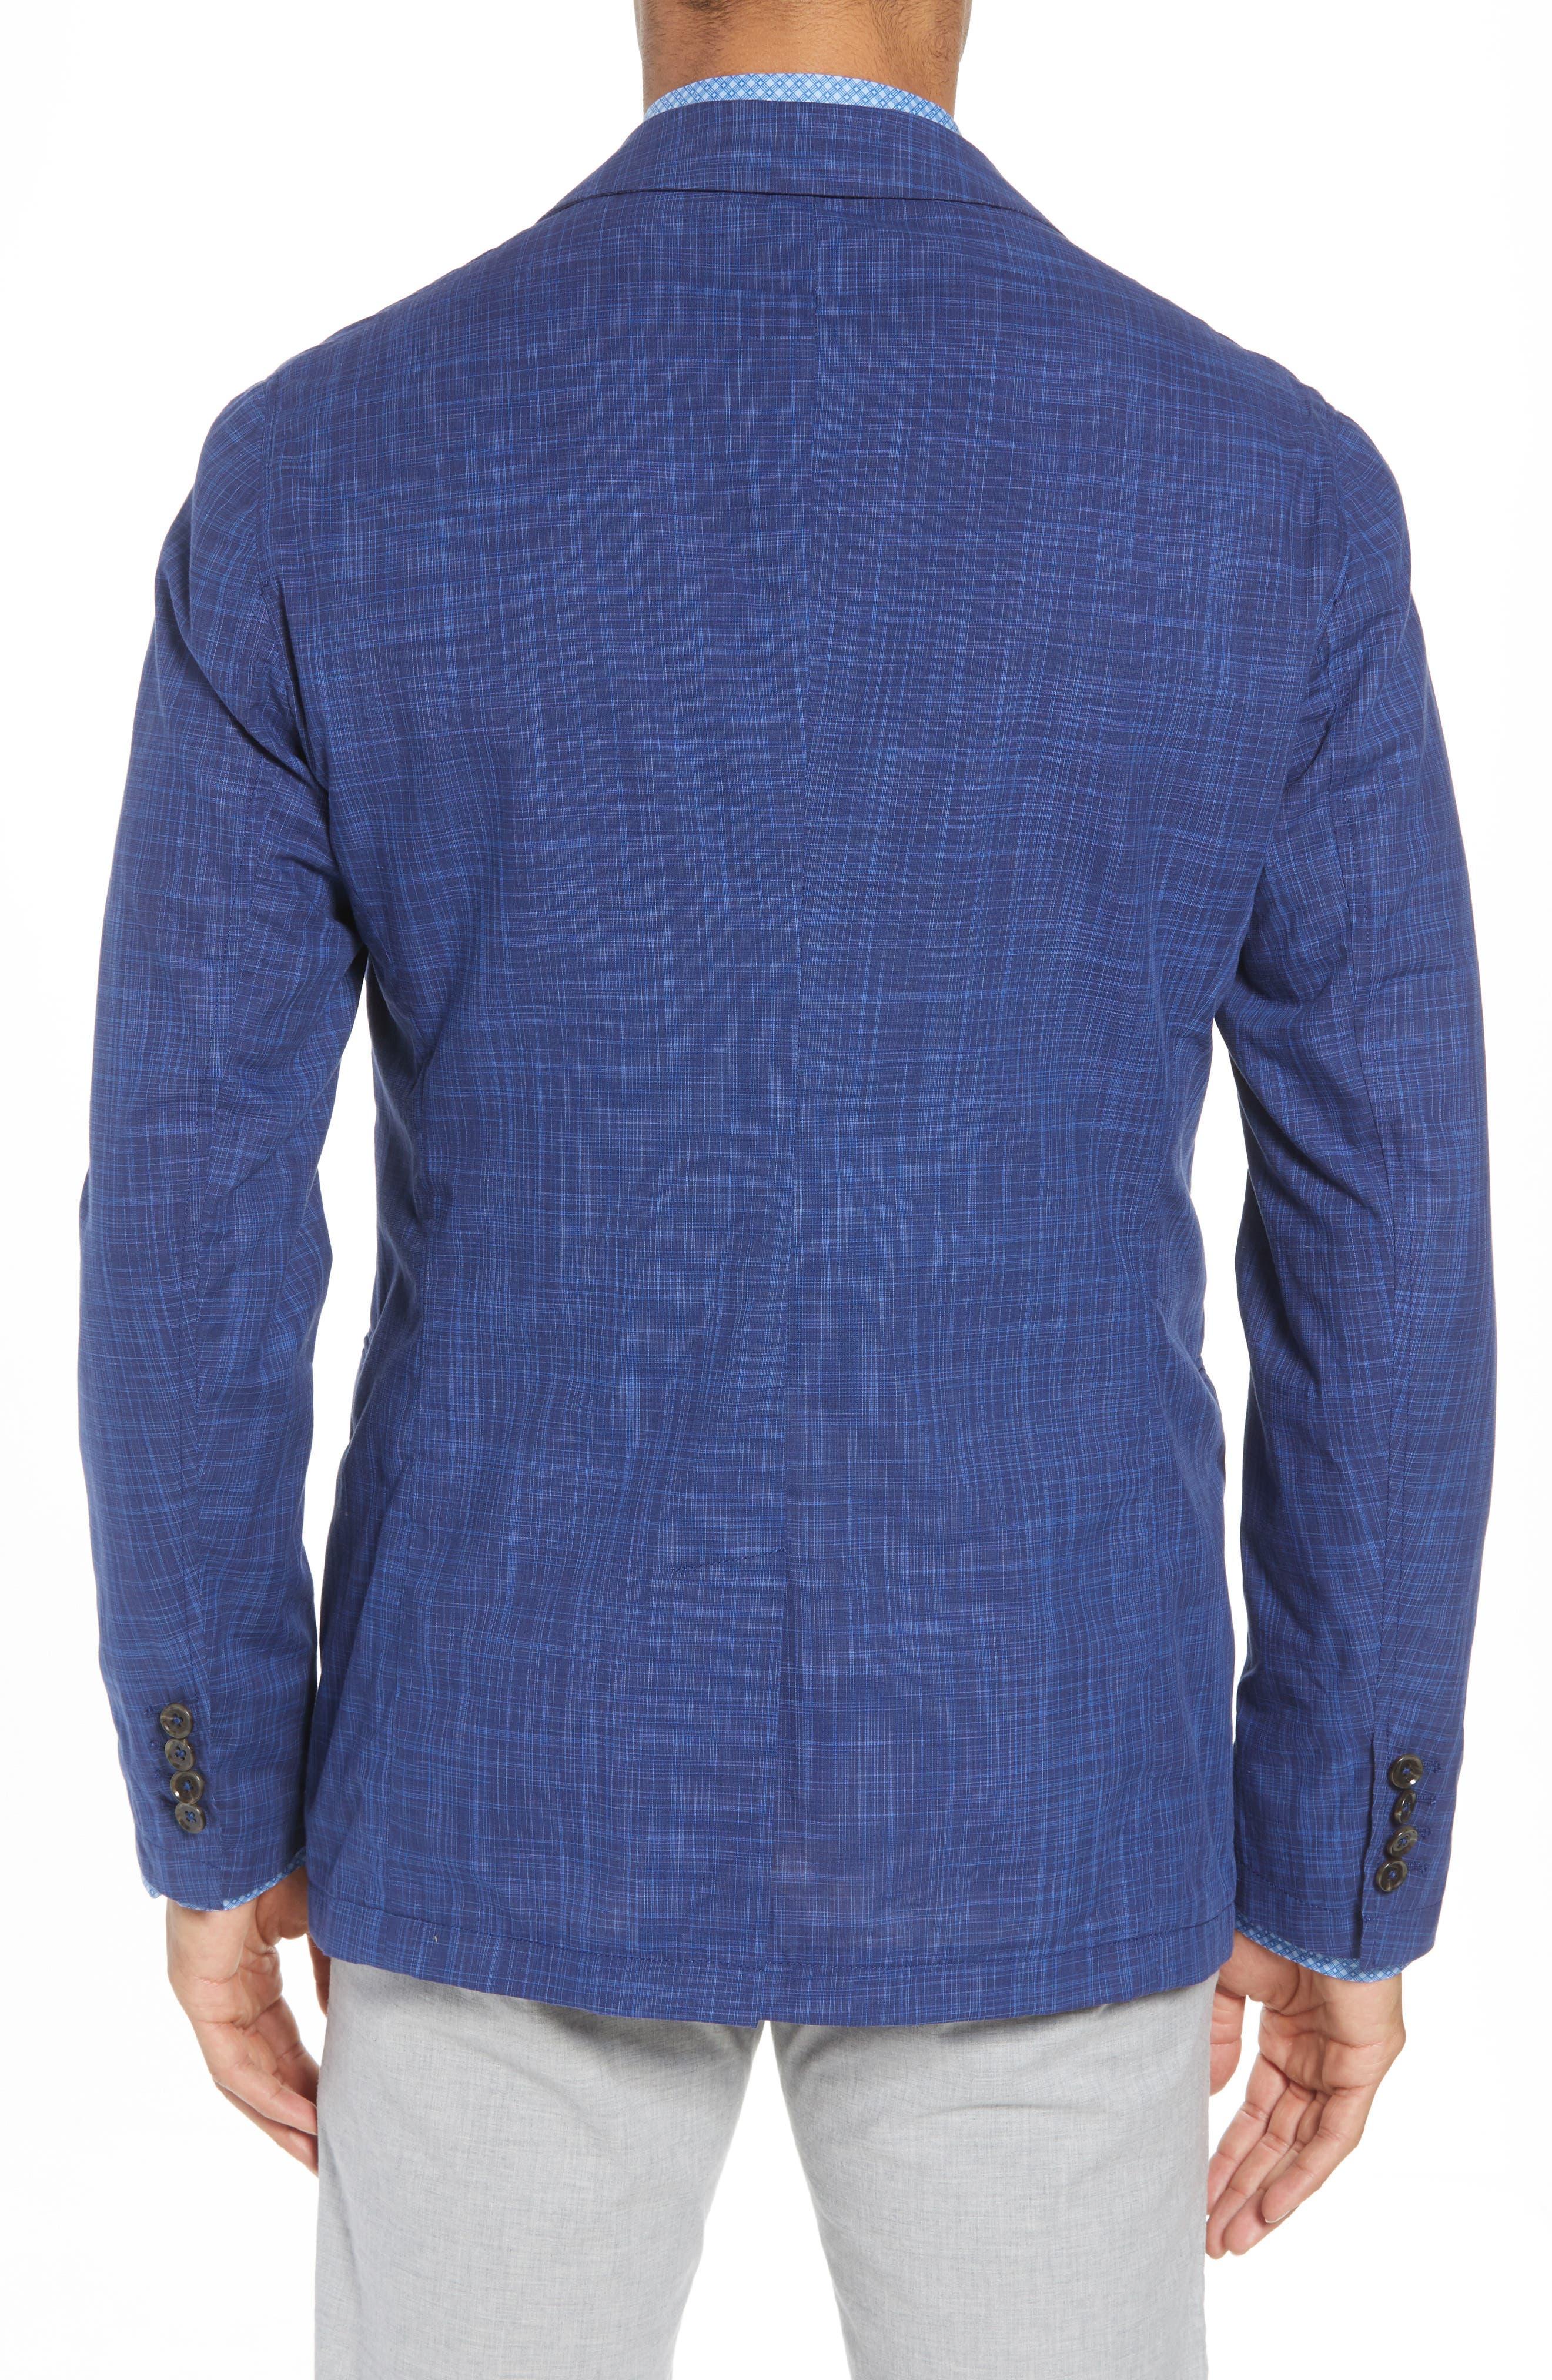 Belmont Regular Fit Sport Coat,                             Alternate thumbnail 2, color,                             Blue